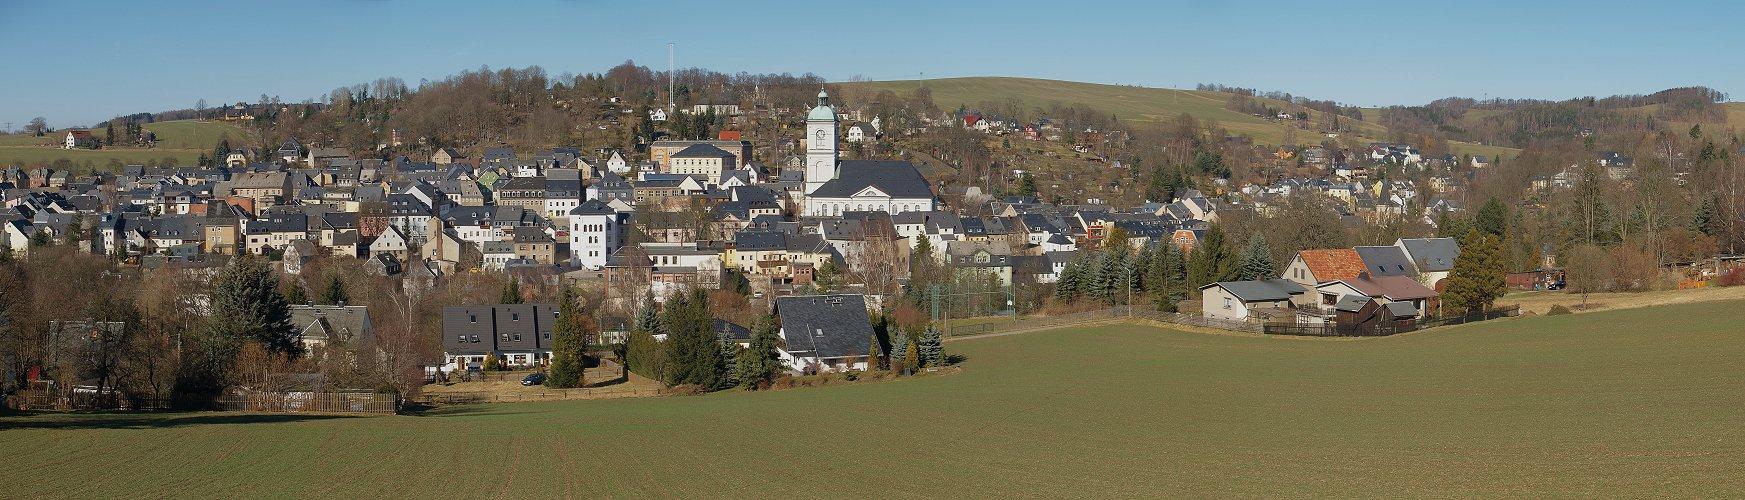 Stadtzentrum Lößnitz